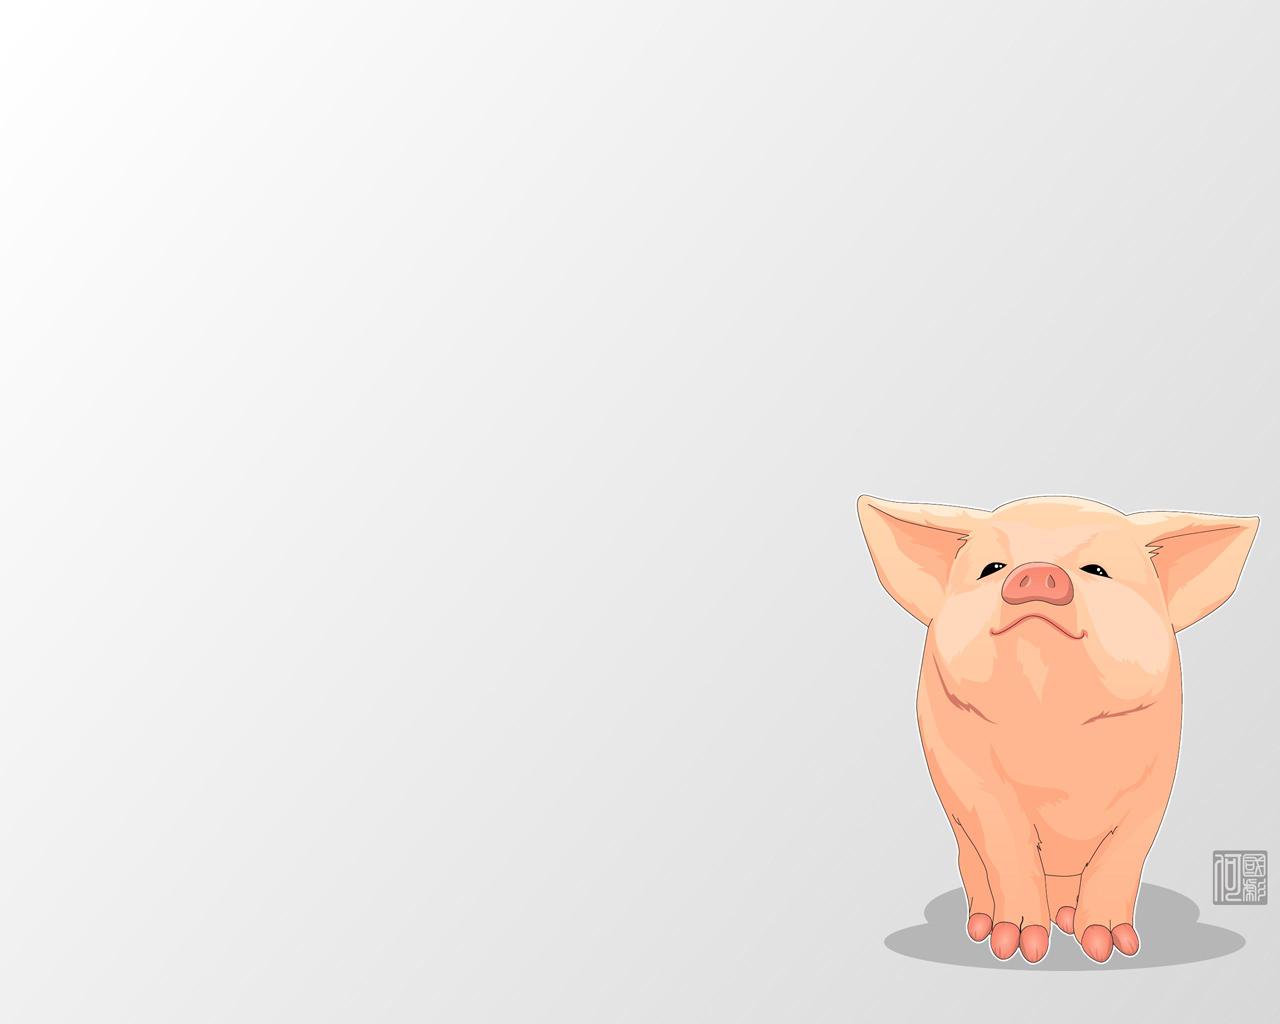 Papel de Parede Desenho de Porco Wallpaper para Download ...